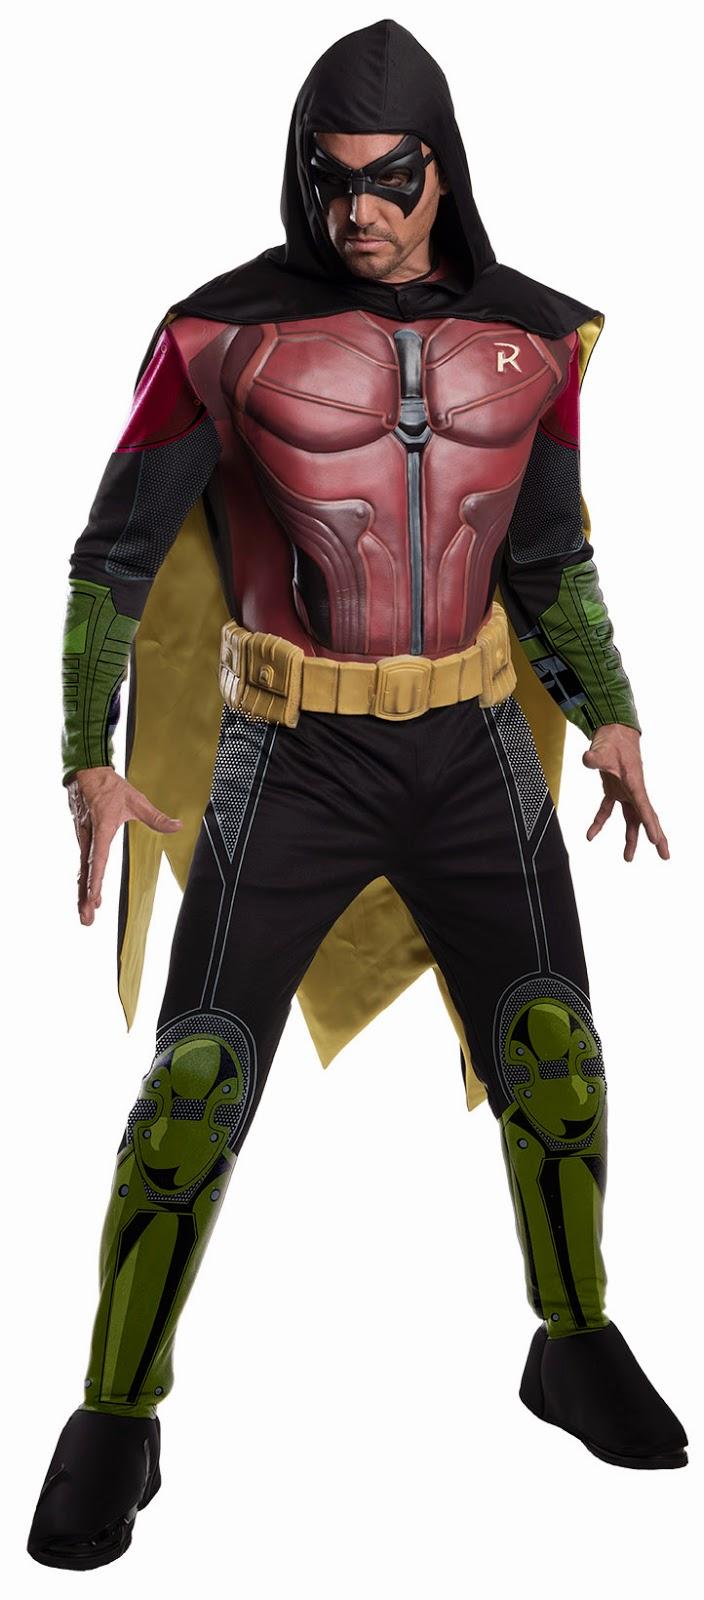 Batman News from Legions of Gotham: October 2014